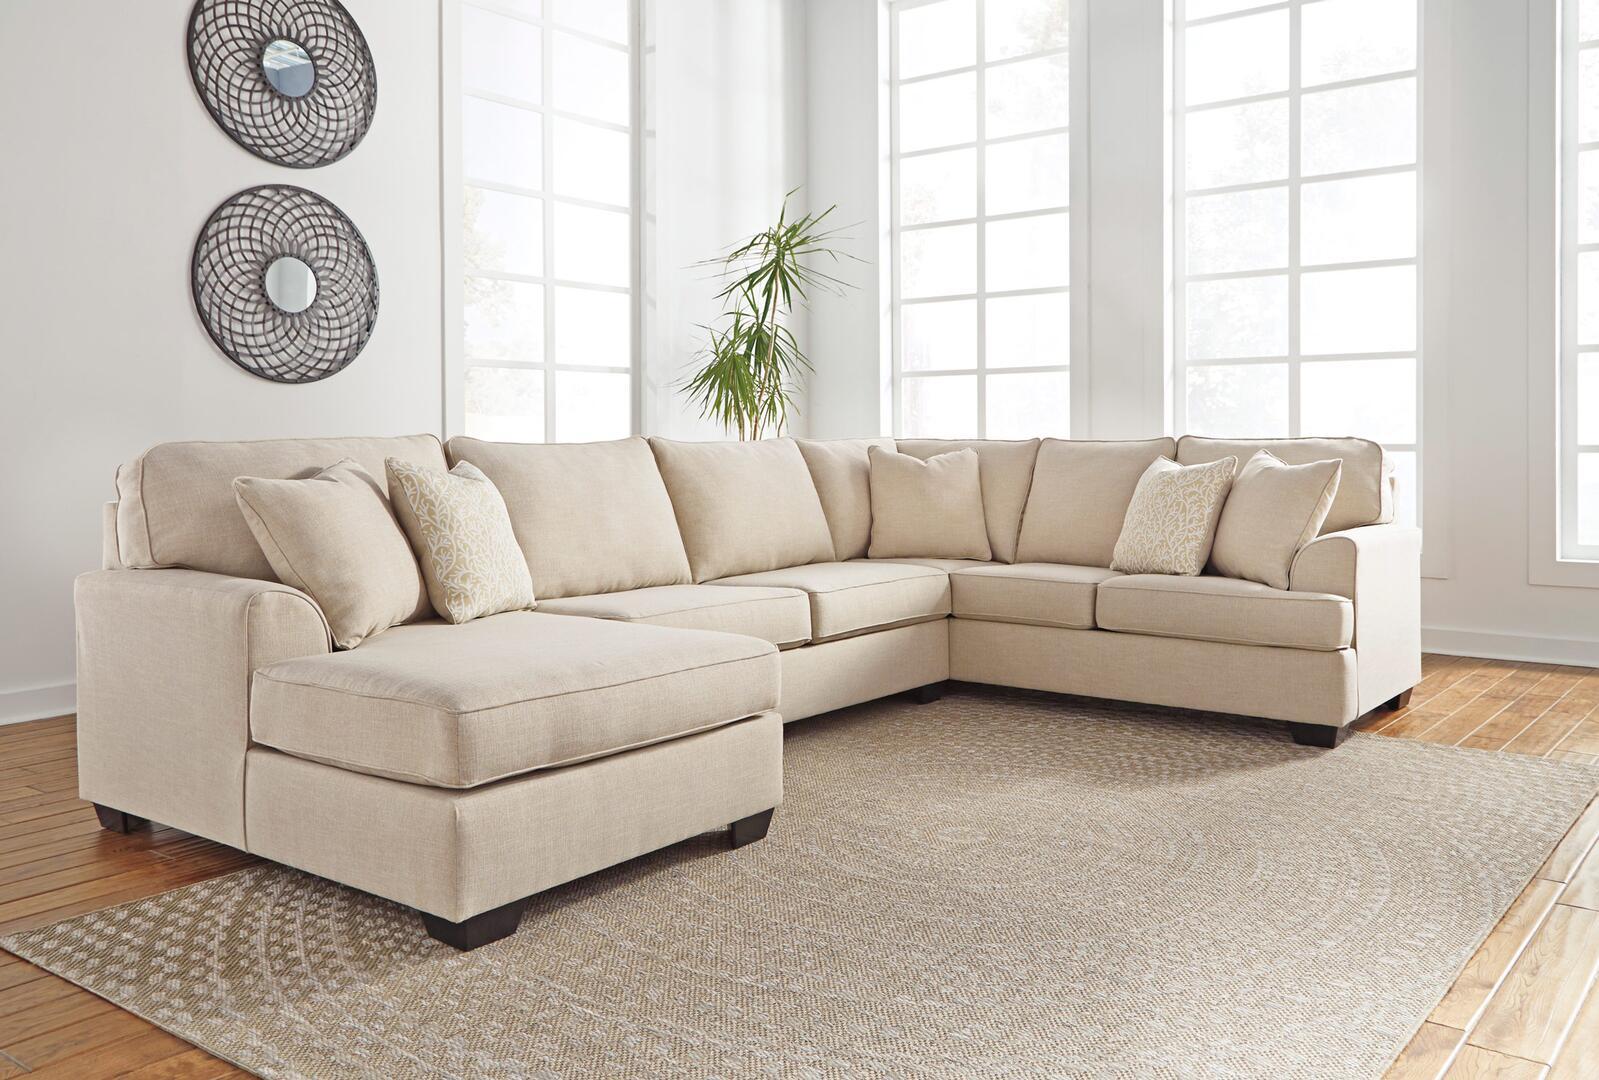 milo corner sofa groupon review sofas in san antonio italia mi7269163467sand karson series stationary